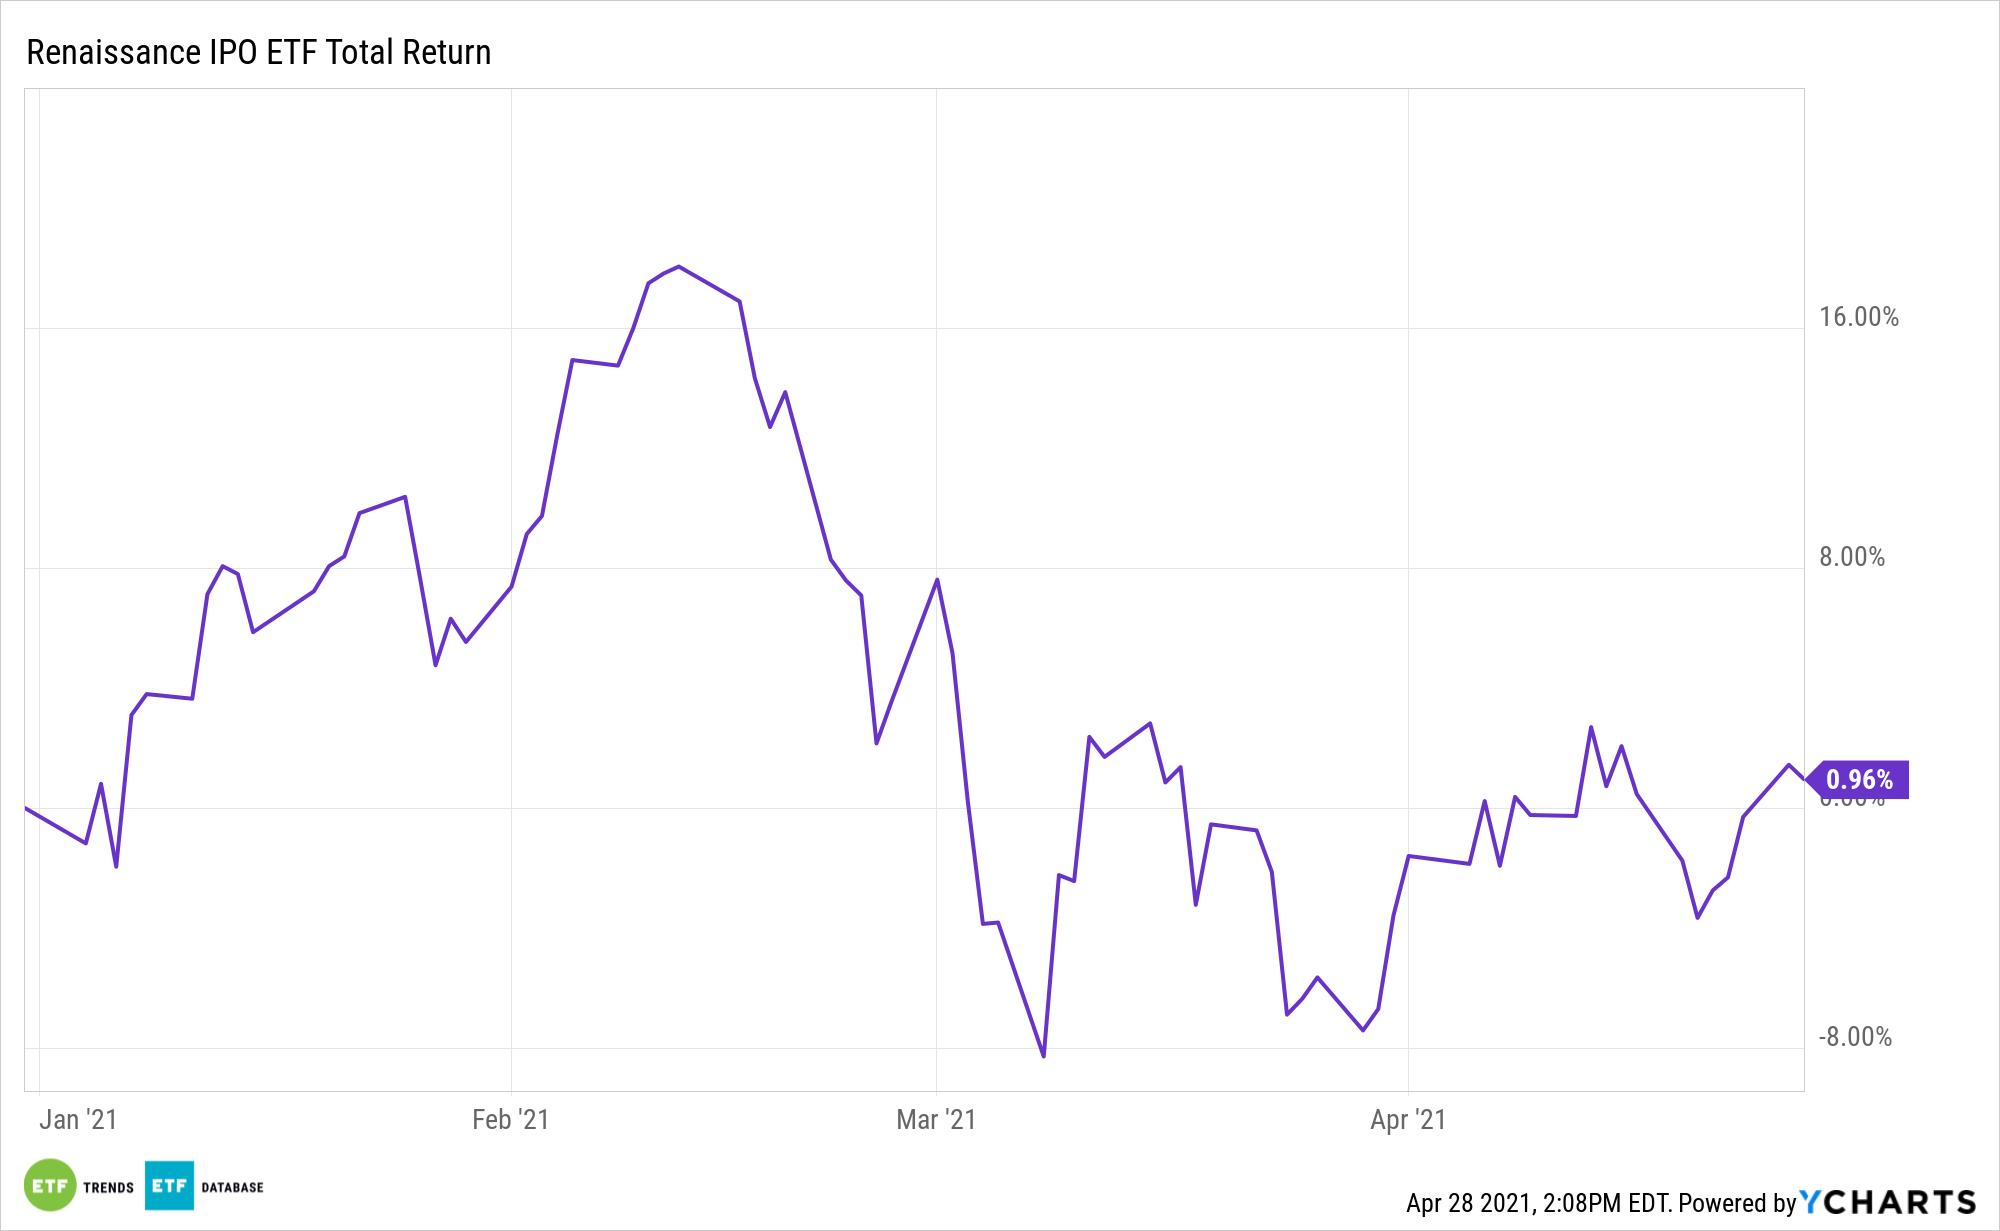 IPO YTD Performance